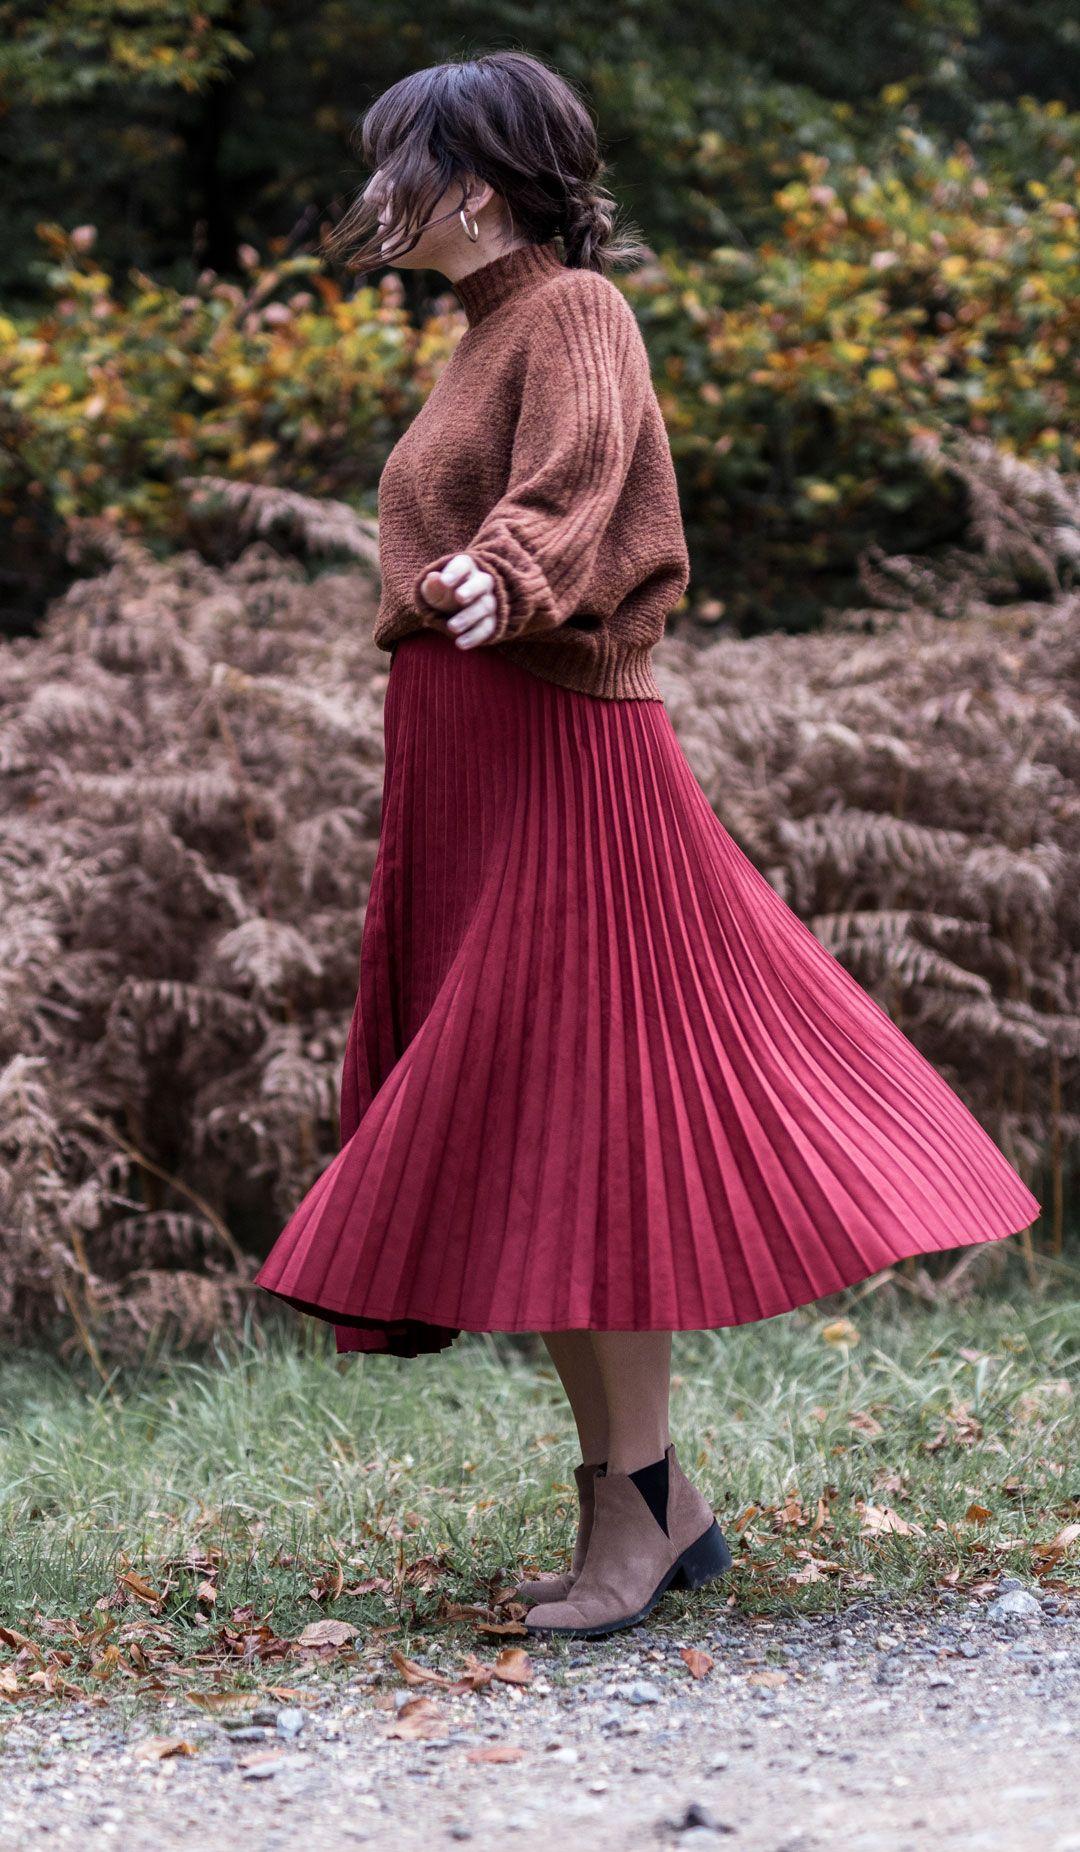 Suede Pleated Midi Skirt: A Love Affair | #pleatedmidiskirt | #falloutfit | #autumnfashion | #fallfashion | #fashioninspiration | #oversizedjumper | #fluffyjumper | Mock turtle neck sweater | #Fashioneditorials | Thetford Park | Saida Antolin | She talks Glam | #Netbag | #meshbag | #meshbagautumn | How to wear a net bag in autumn | #effortlesschic | #minimallook | #positivefashion | #fallcolours | How to style a midi skirt if you are petite